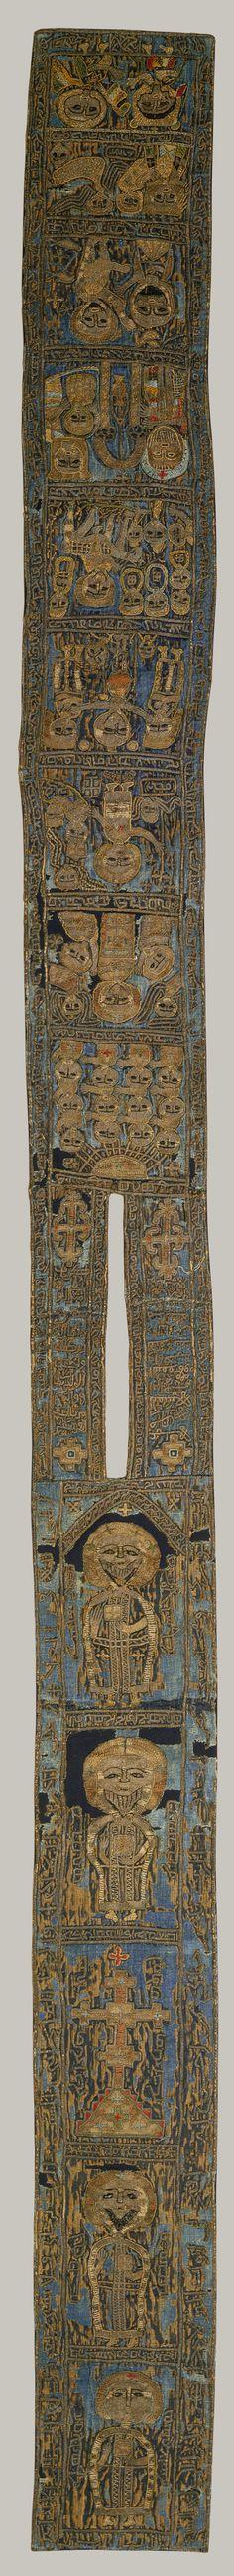 Batrashil, Mamluk period (1250–1517), 1336 Syria Silk backed with heavy linen Metropolitan Museum